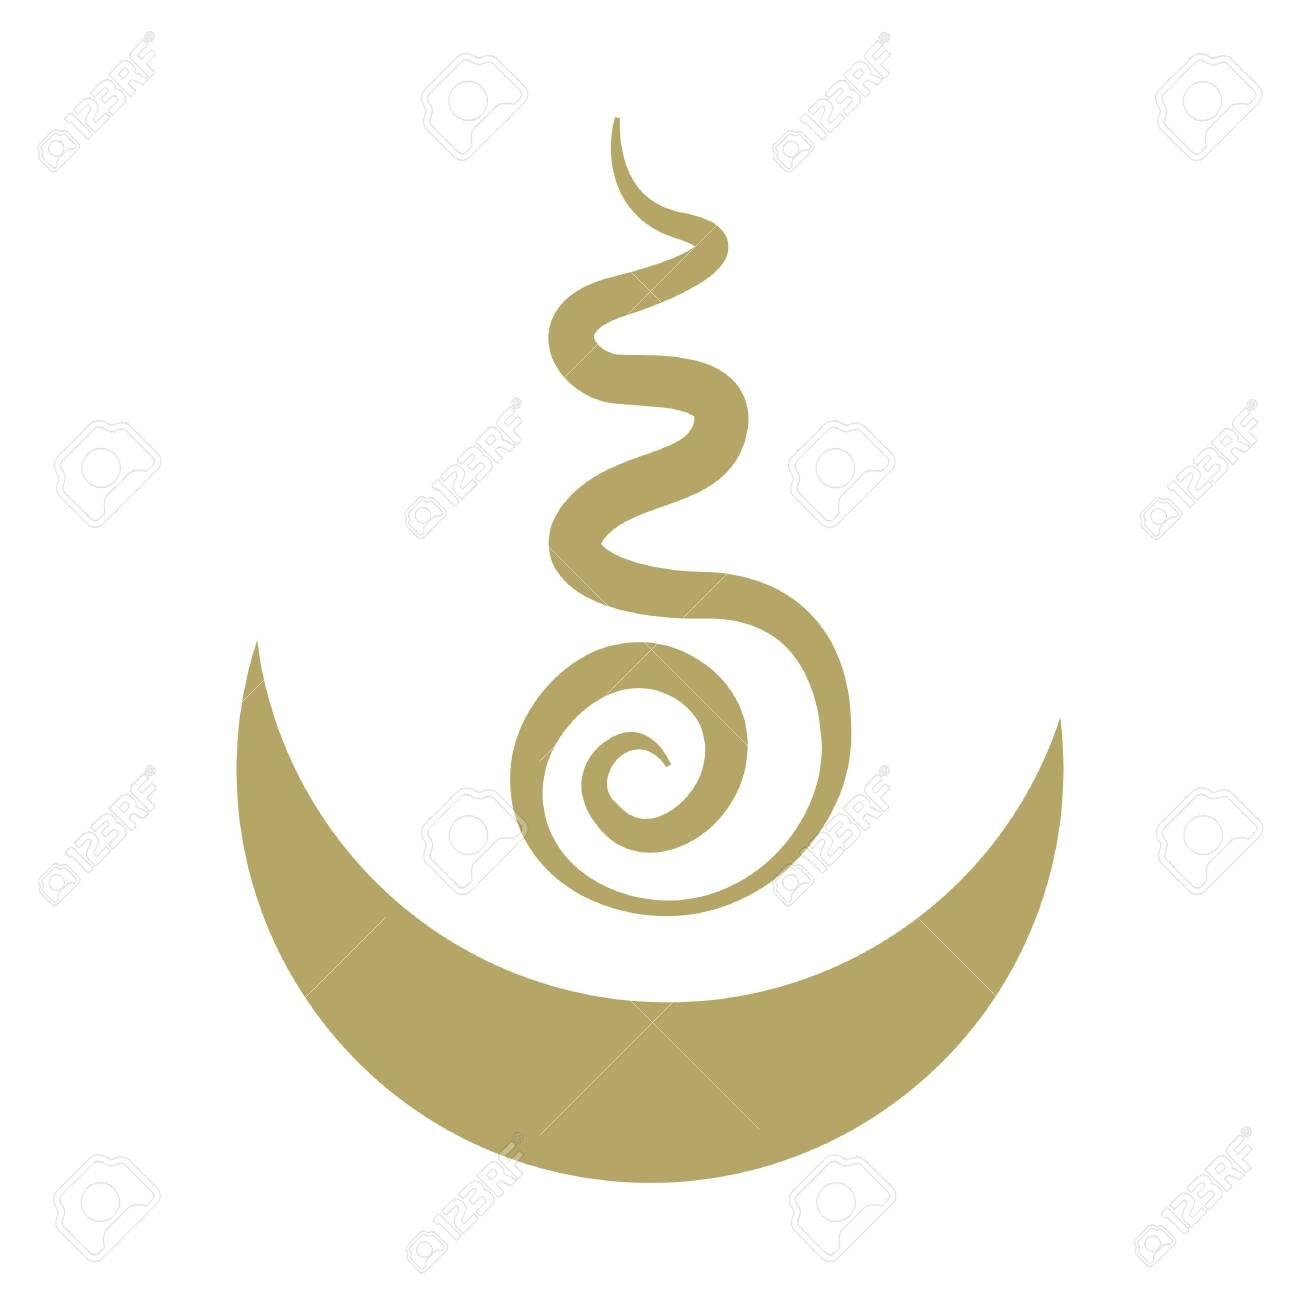 Stylized ornamental Tibetan vector symbol for universe, moon and sun - 135680656